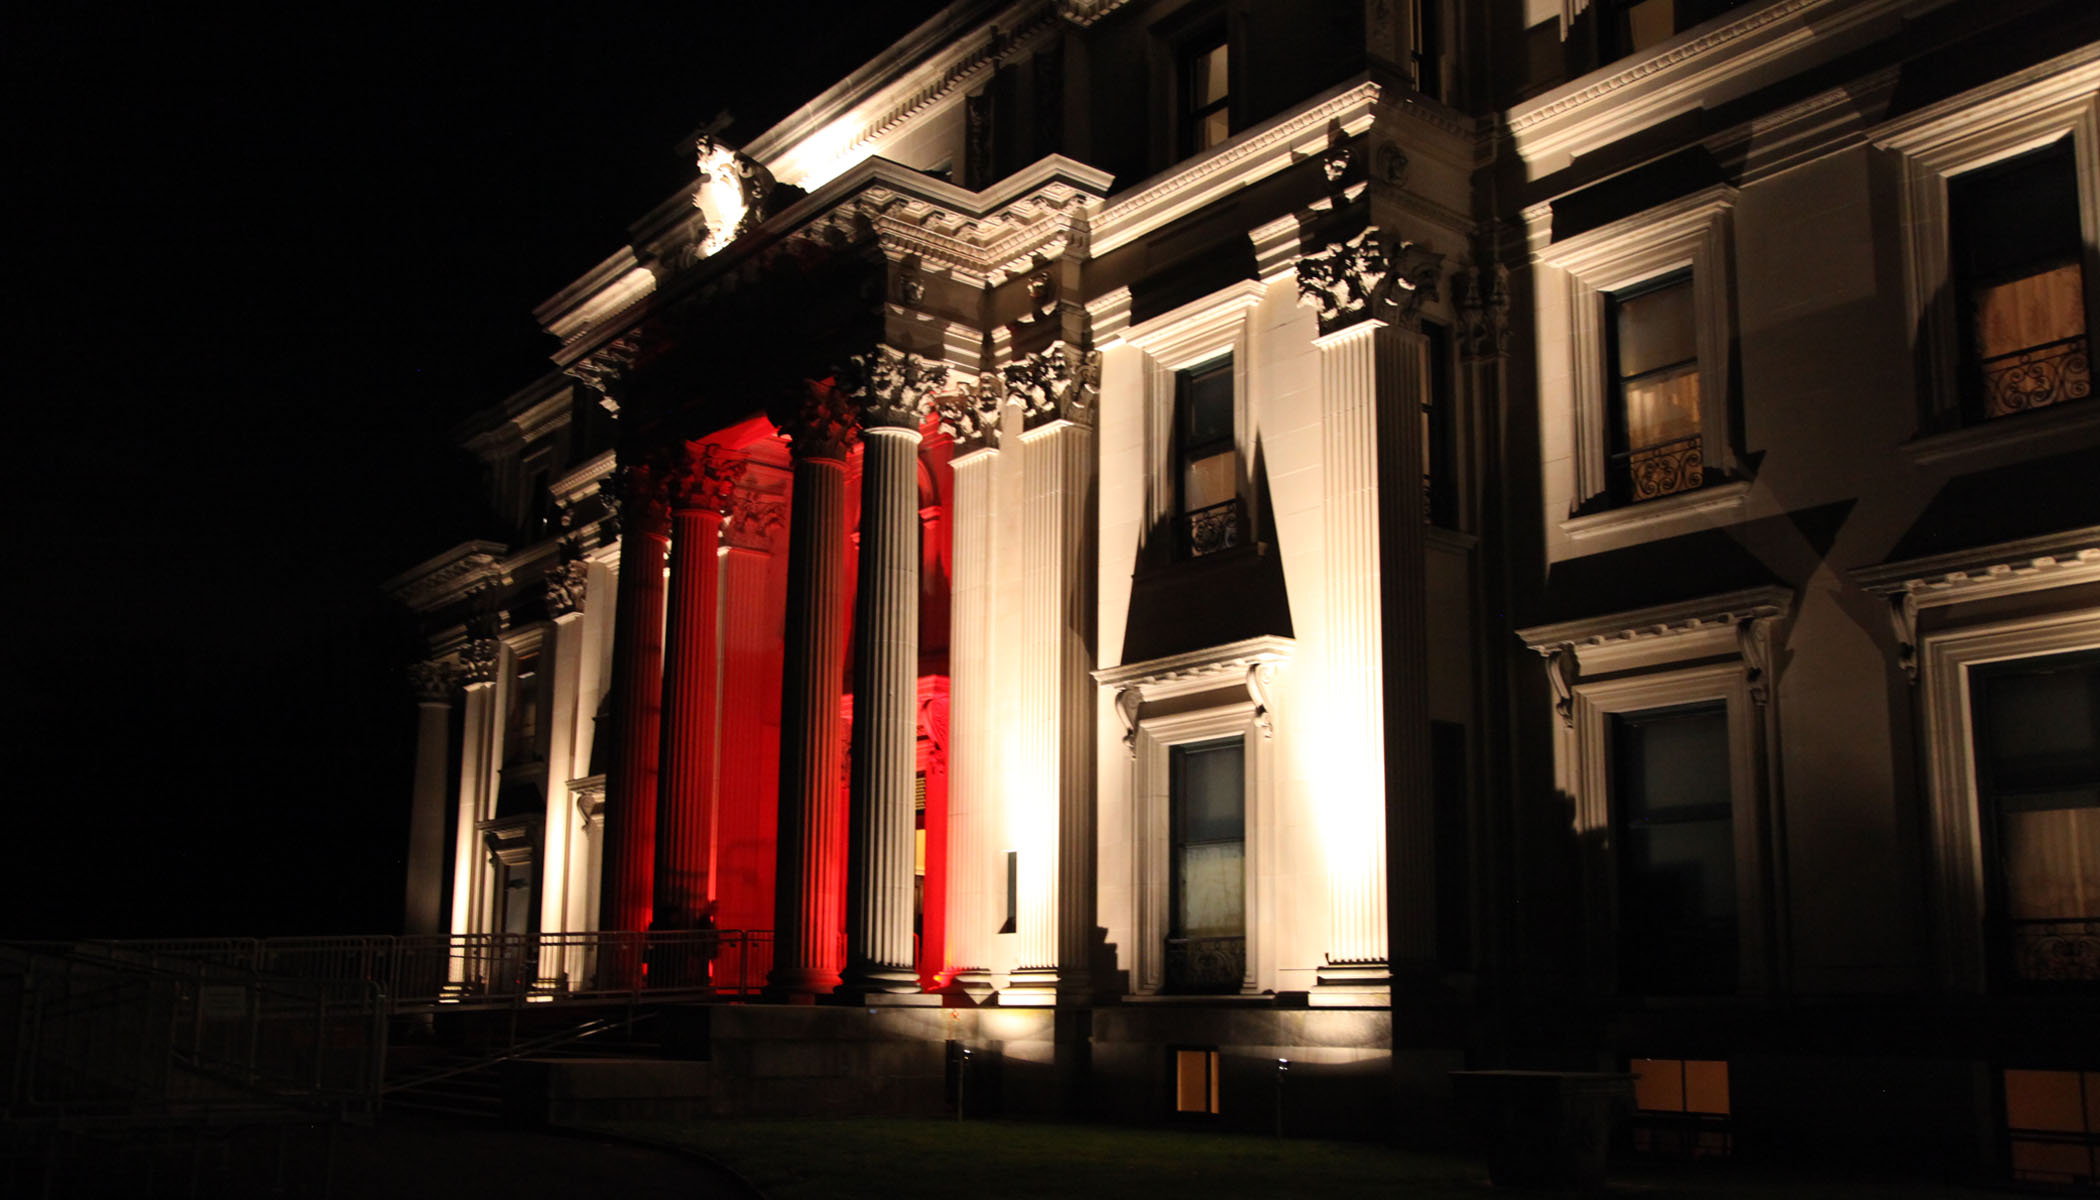 The Vanderbilt Mansion